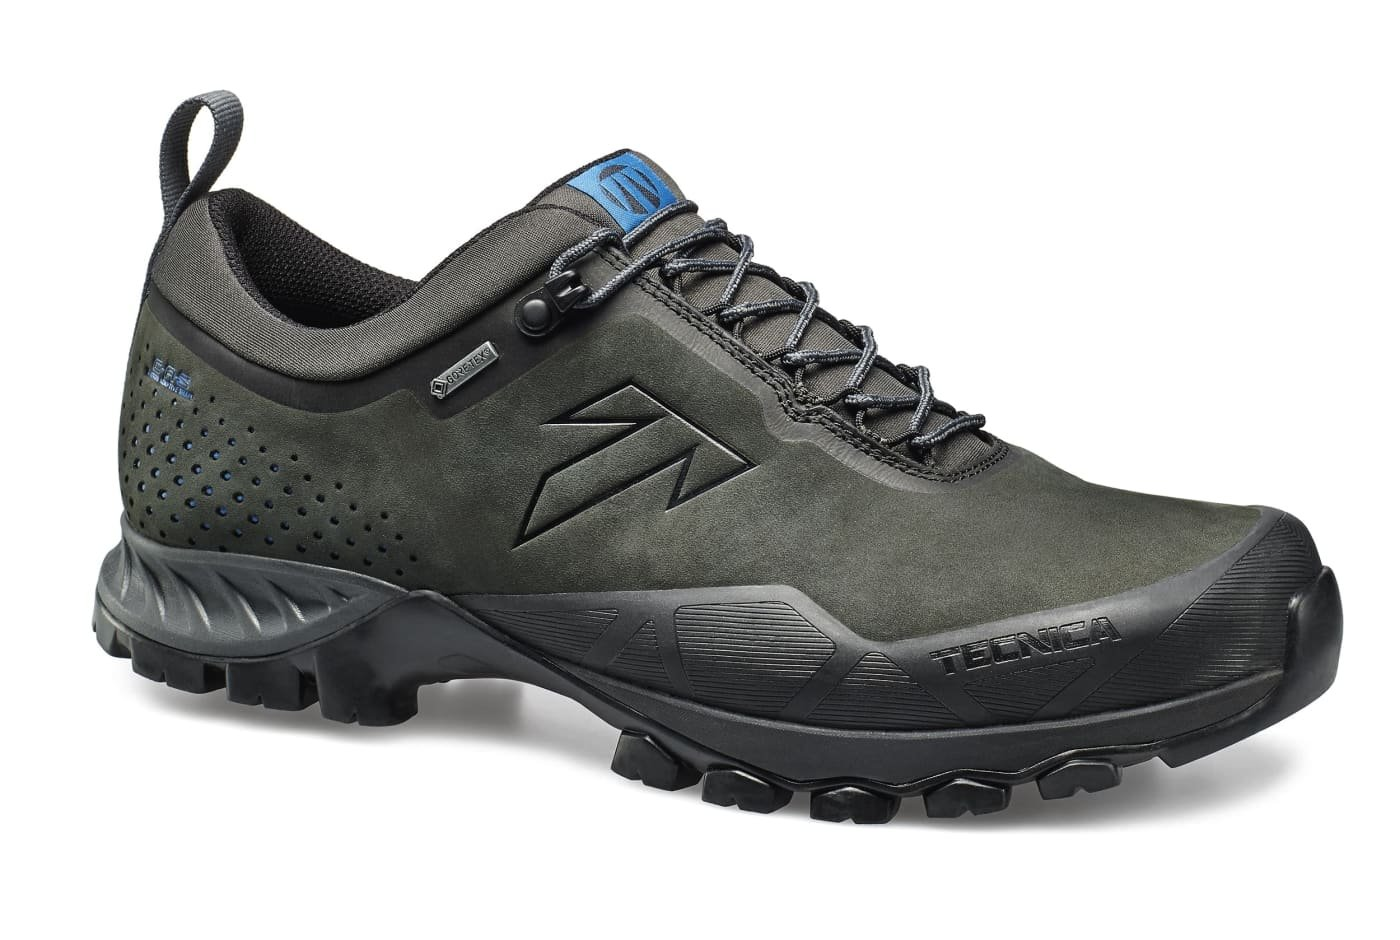 Tecnica Plasma GTX MS Hiking Shoe - Dark Deserto Brown